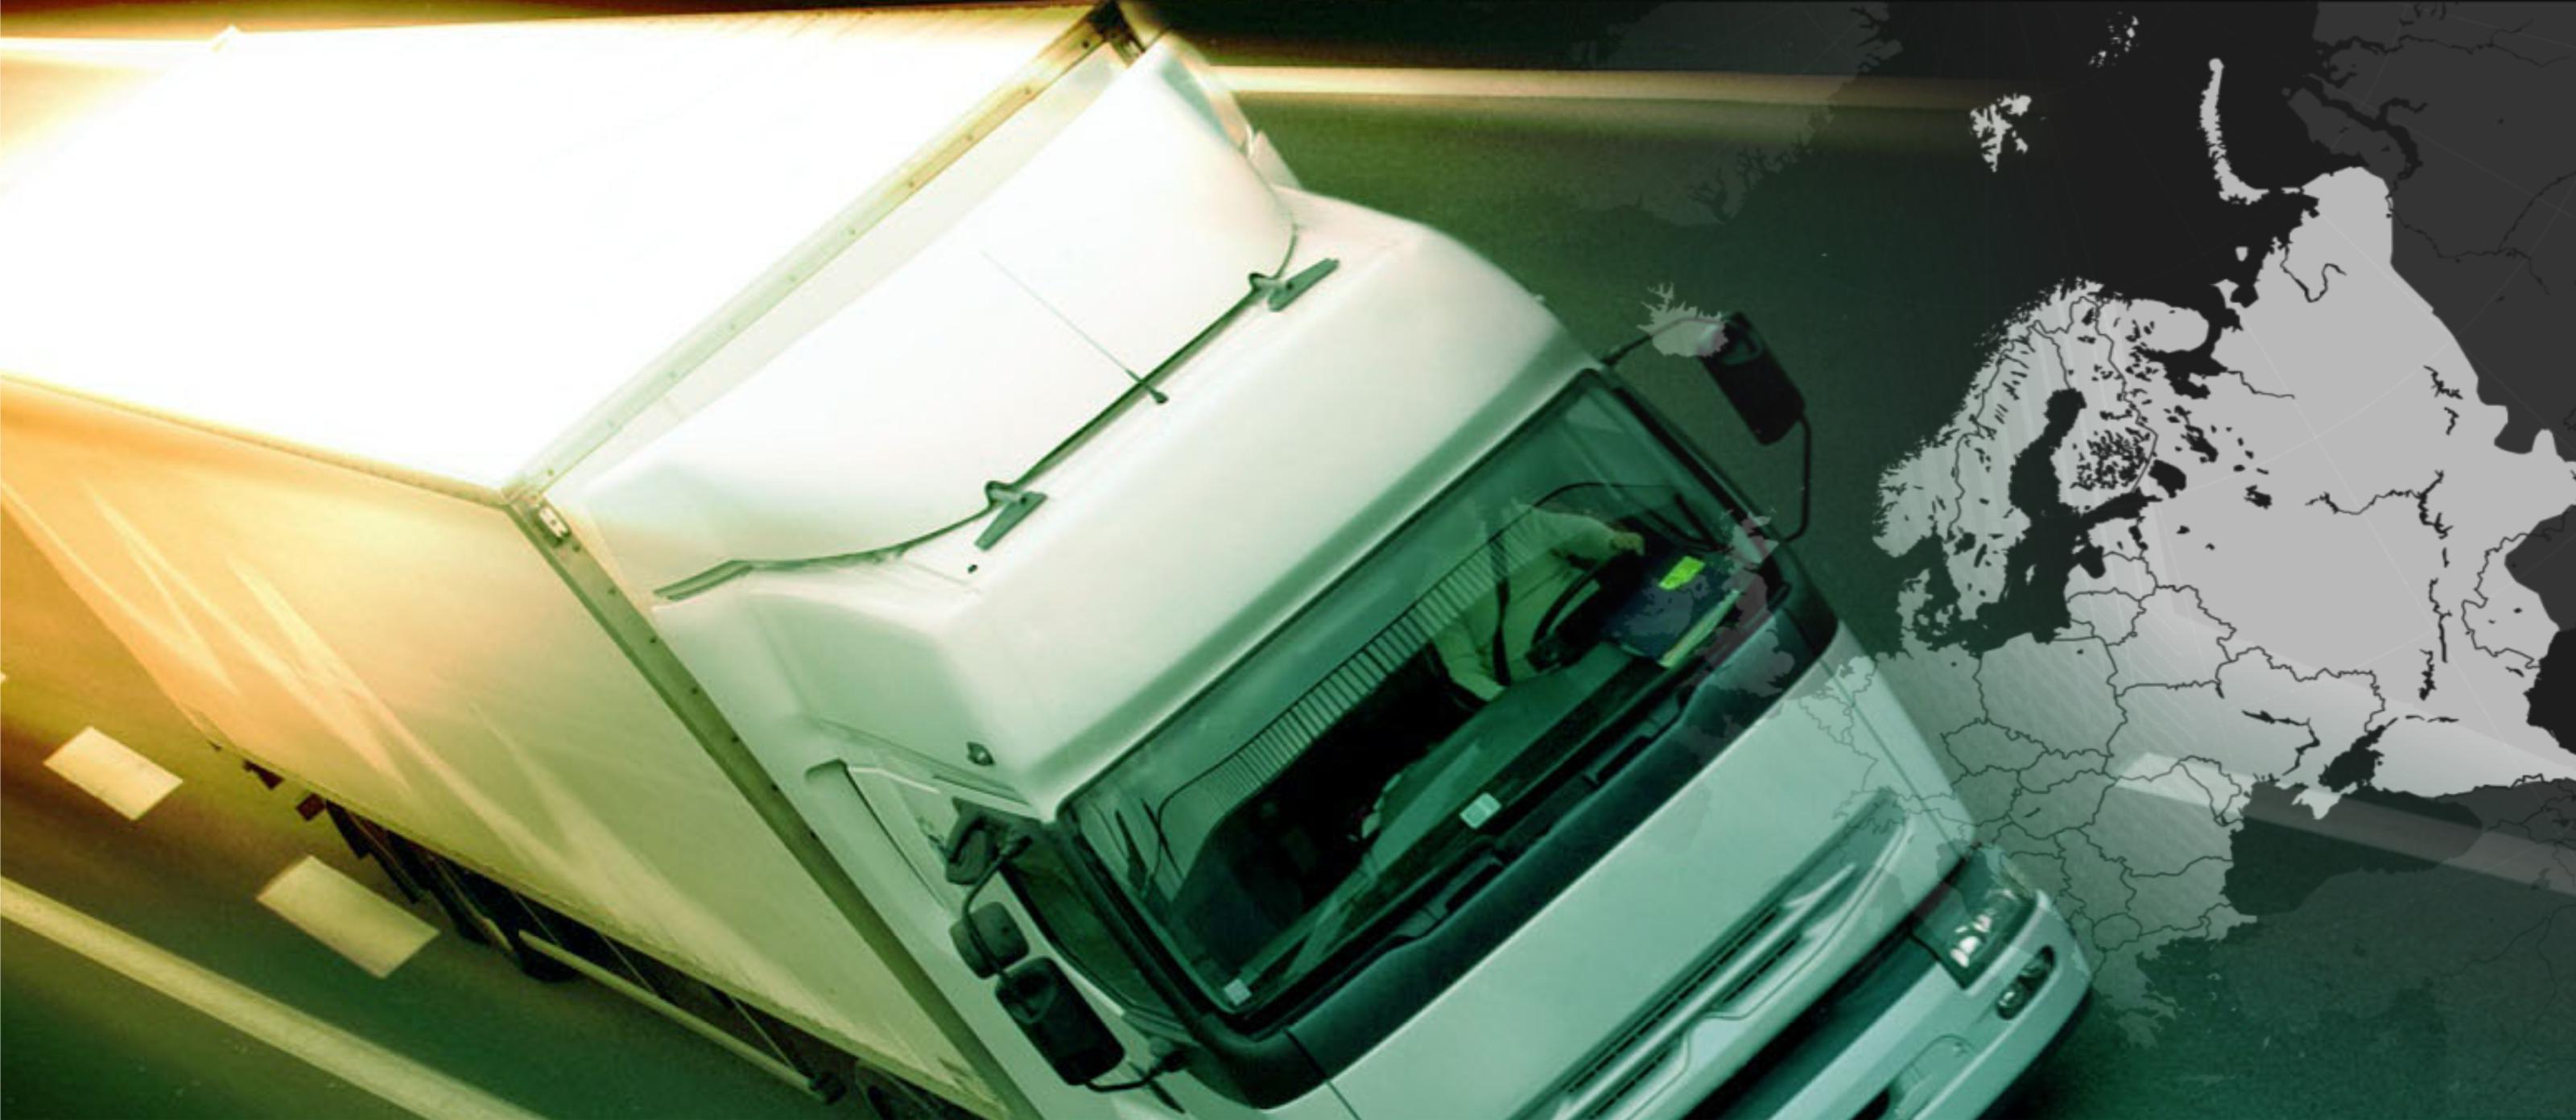 Transport vehicle monitoring